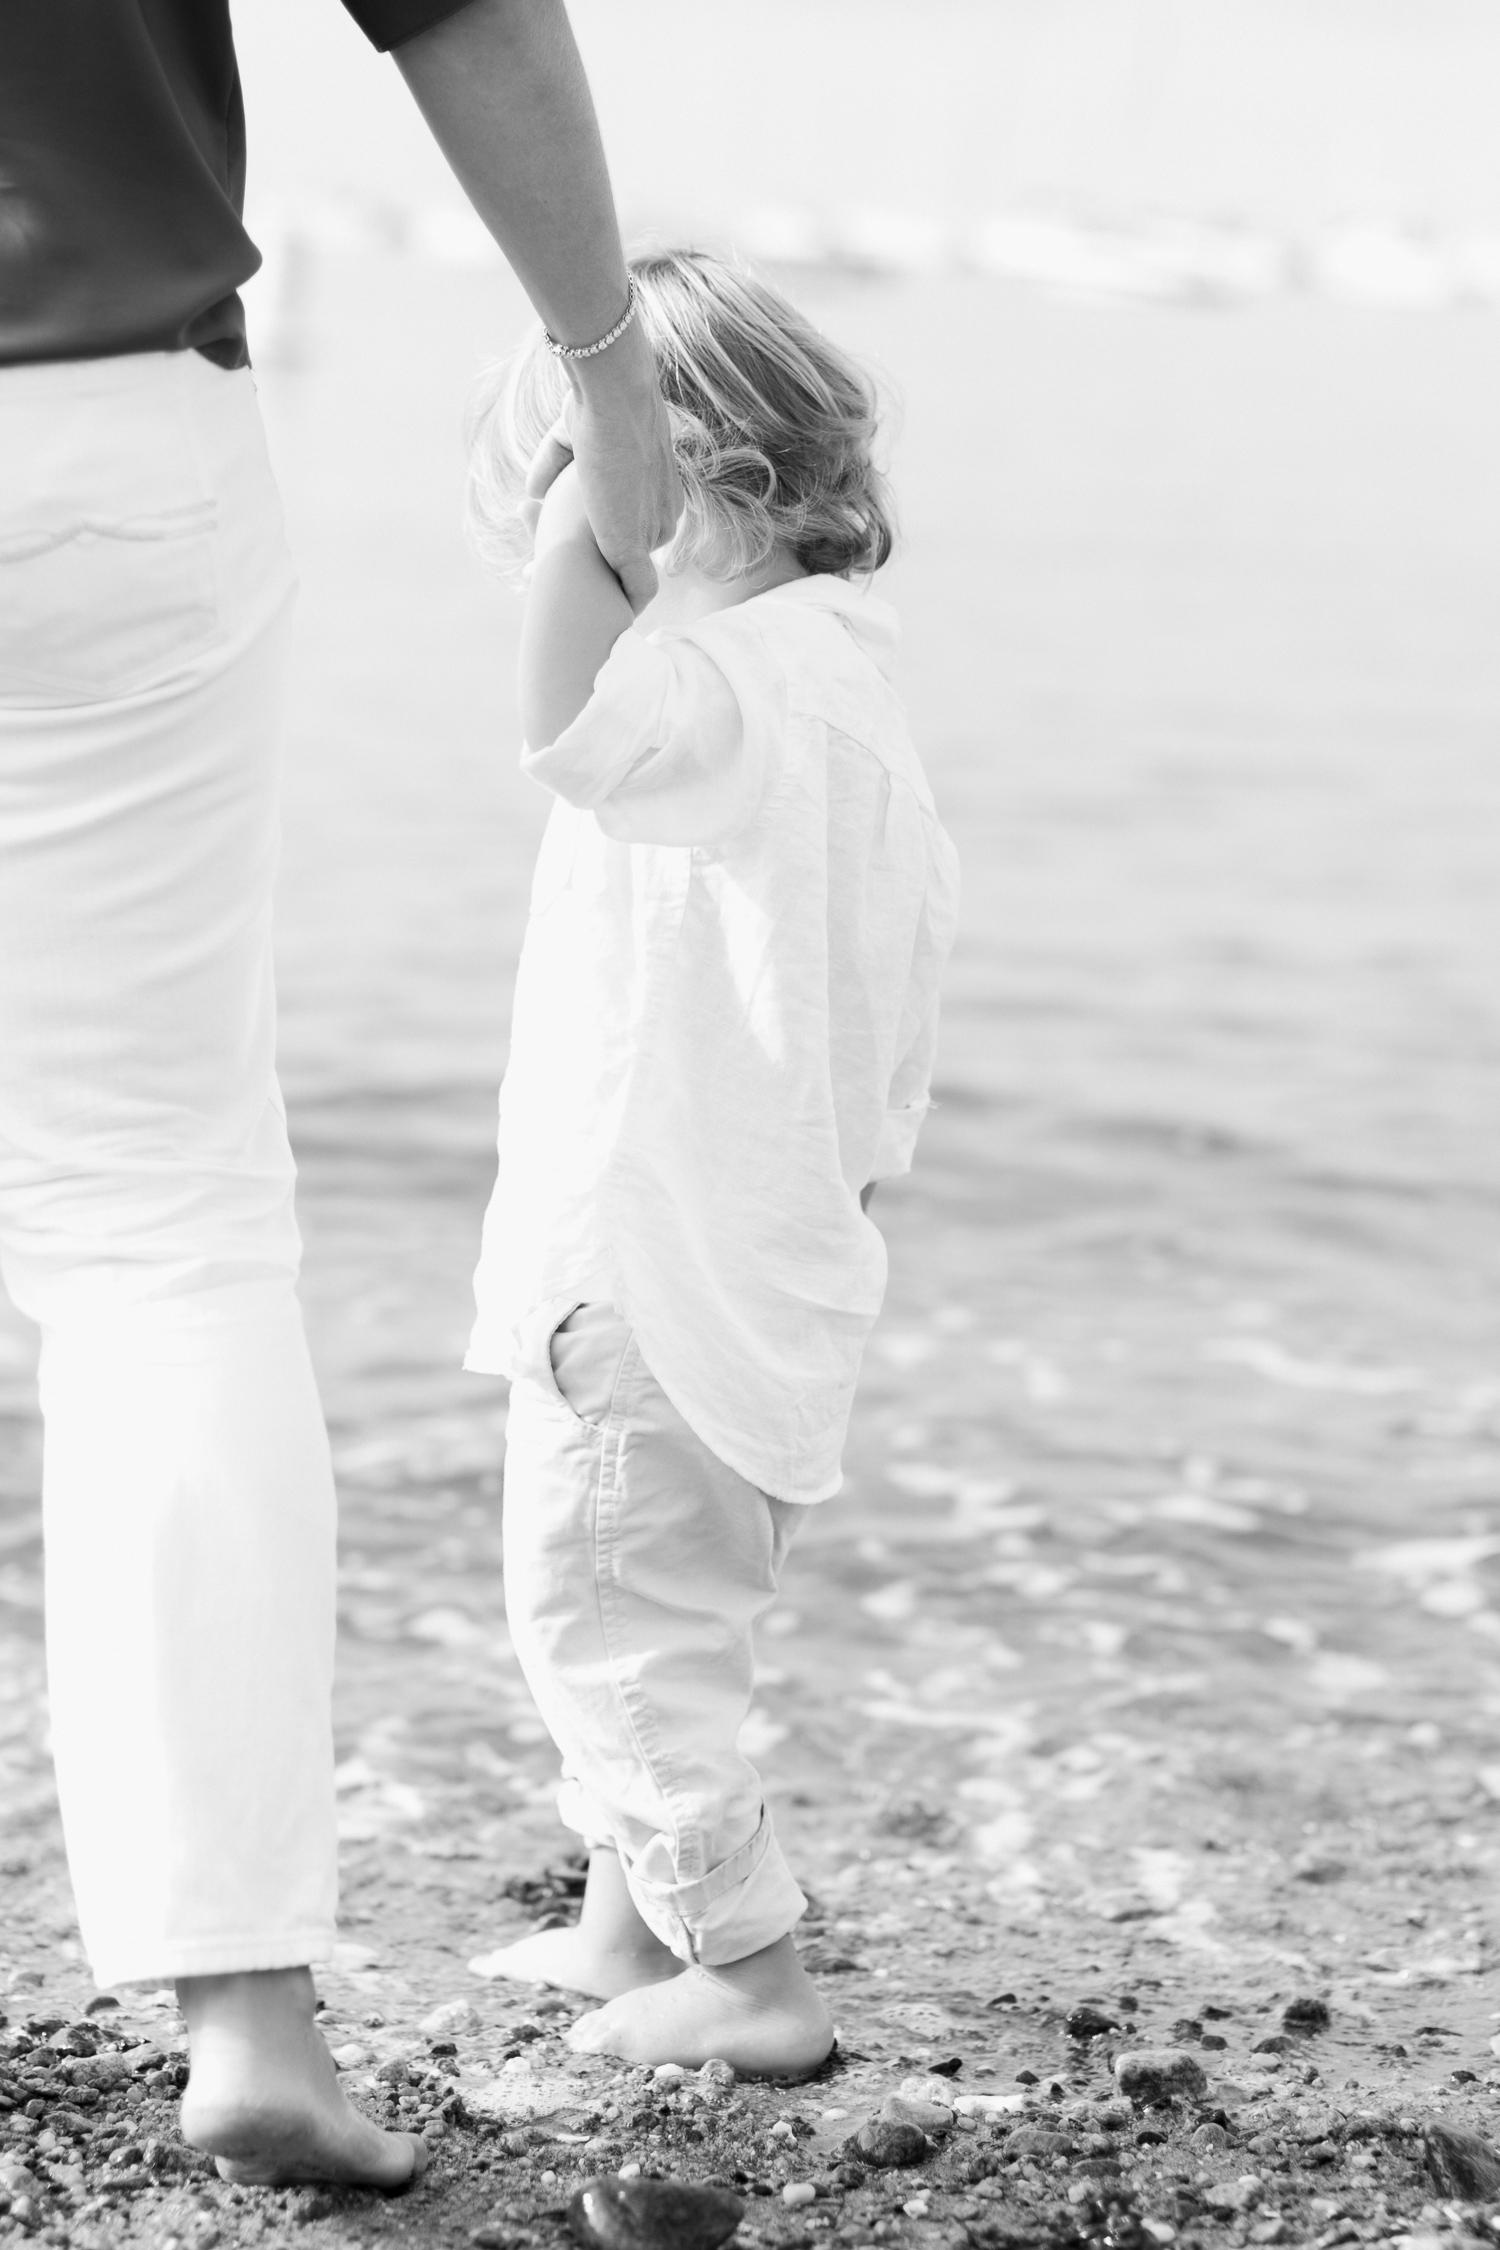 Fairfield-County-Darien-Pear-Tree-Point-Beach-Family-Photography-Natural-Light-mom